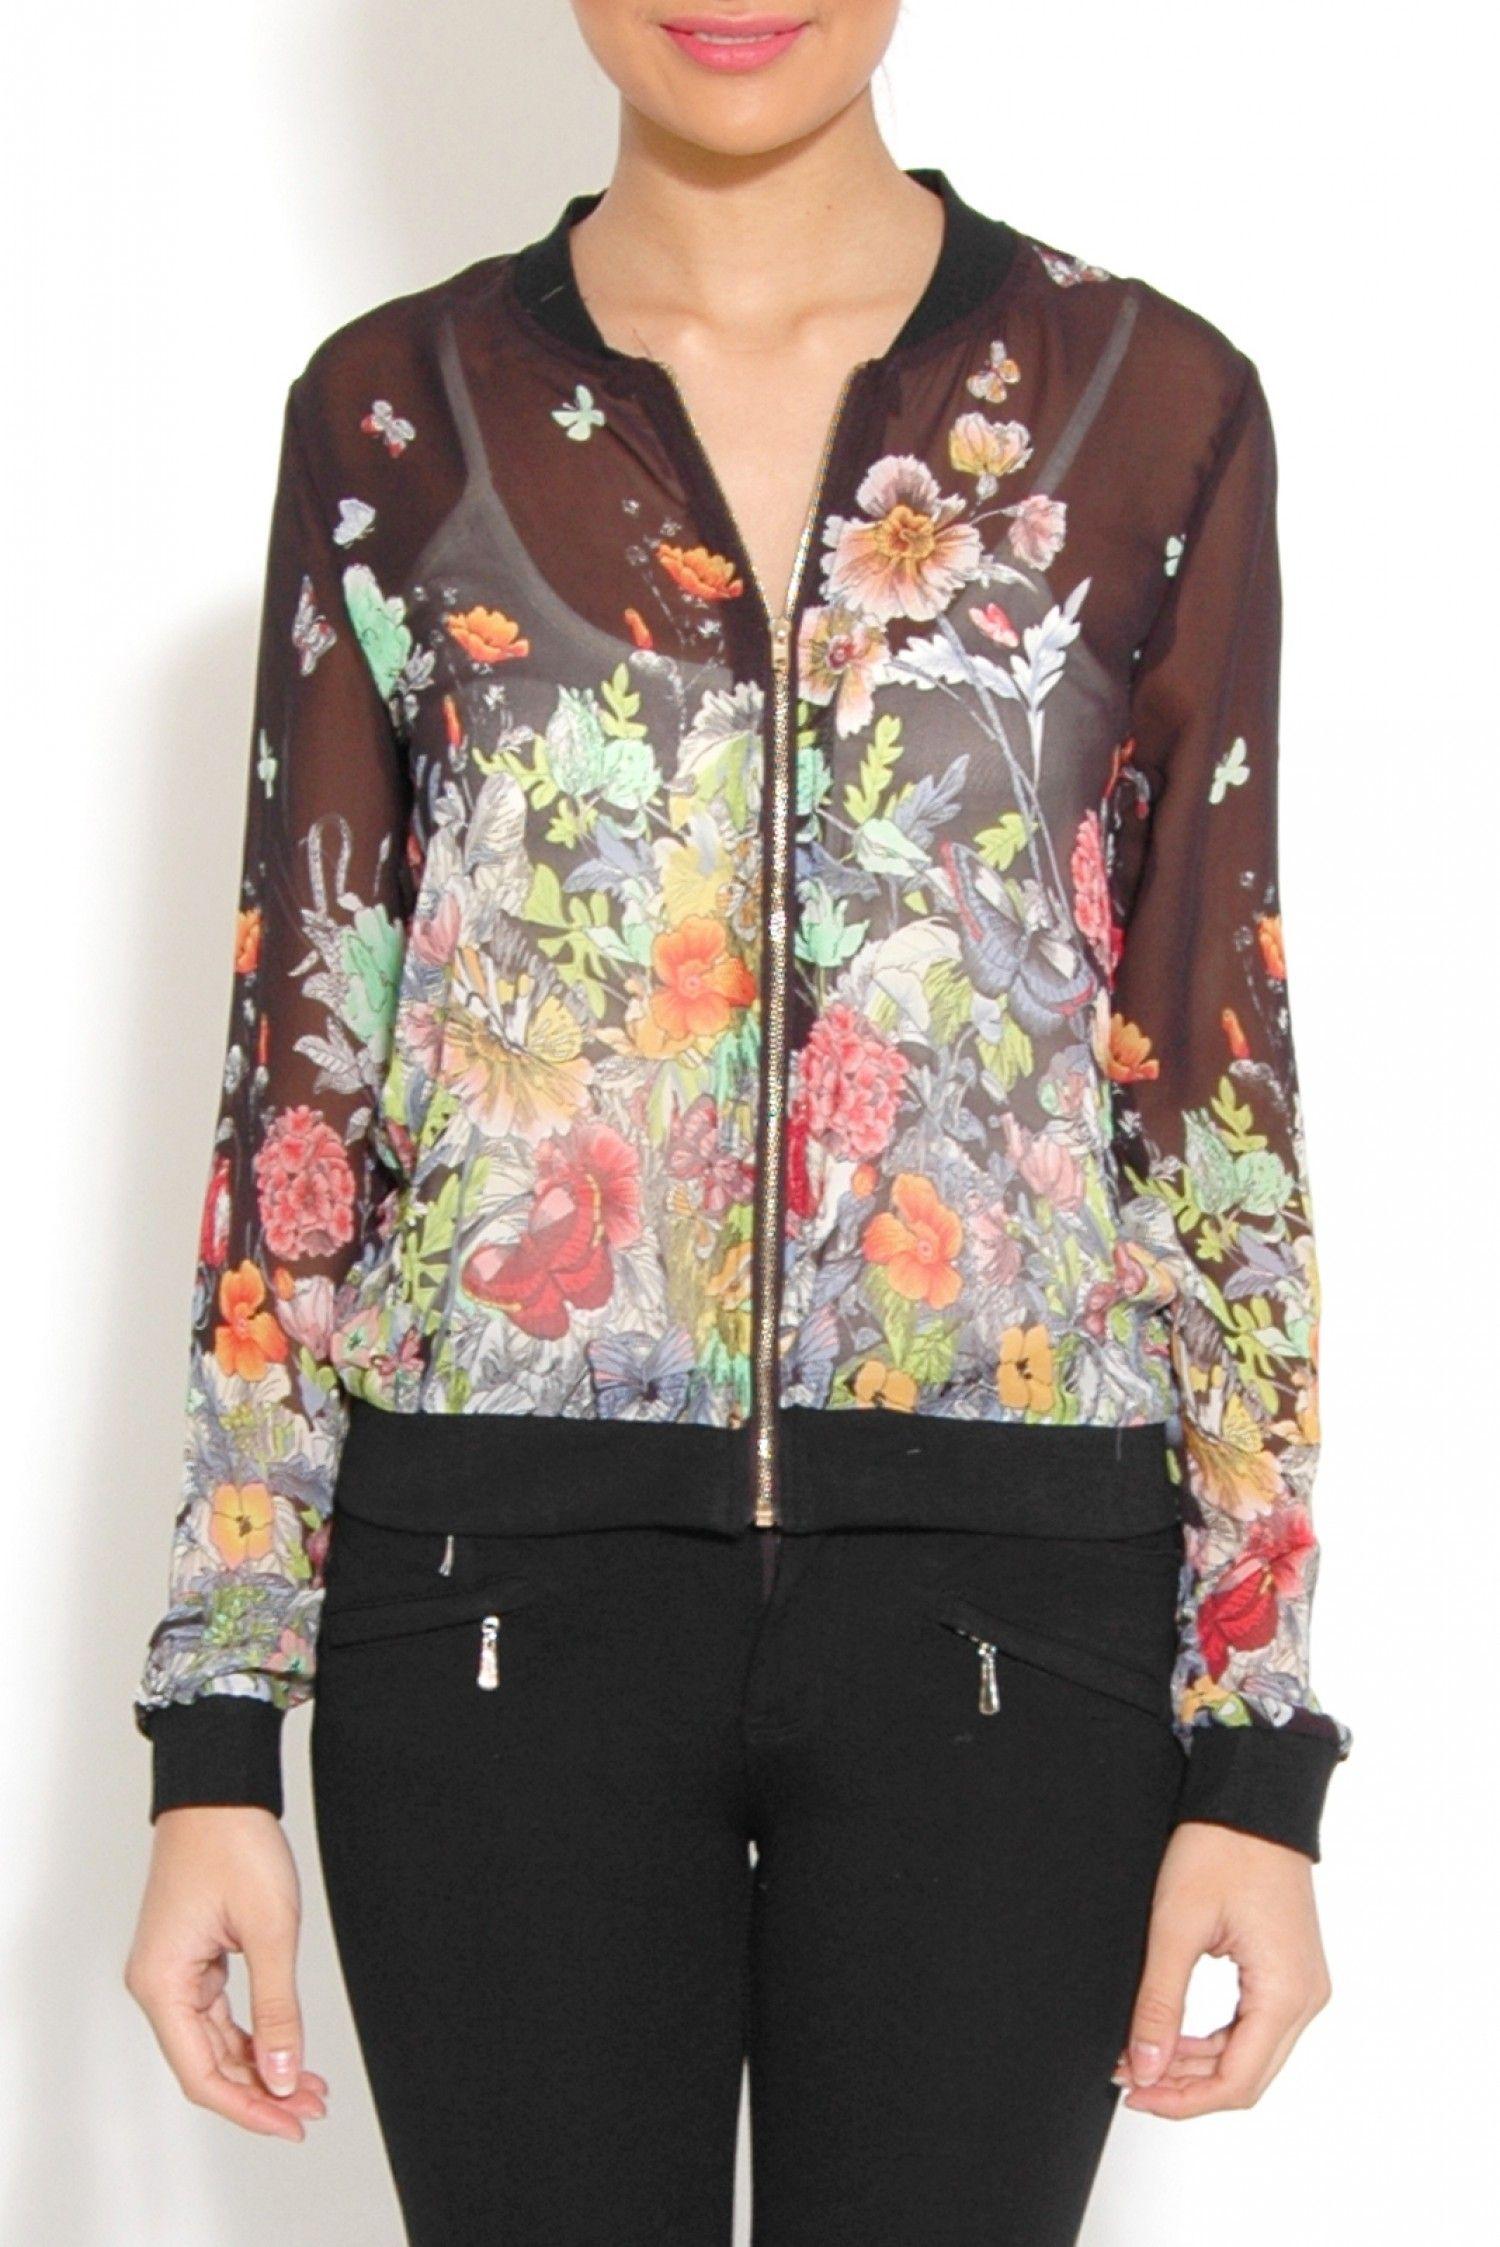 Black Floral Sheer Bomber Jacket Bomber Jacket Clothes Jackets [ 2247 x 1500 Pixel ]